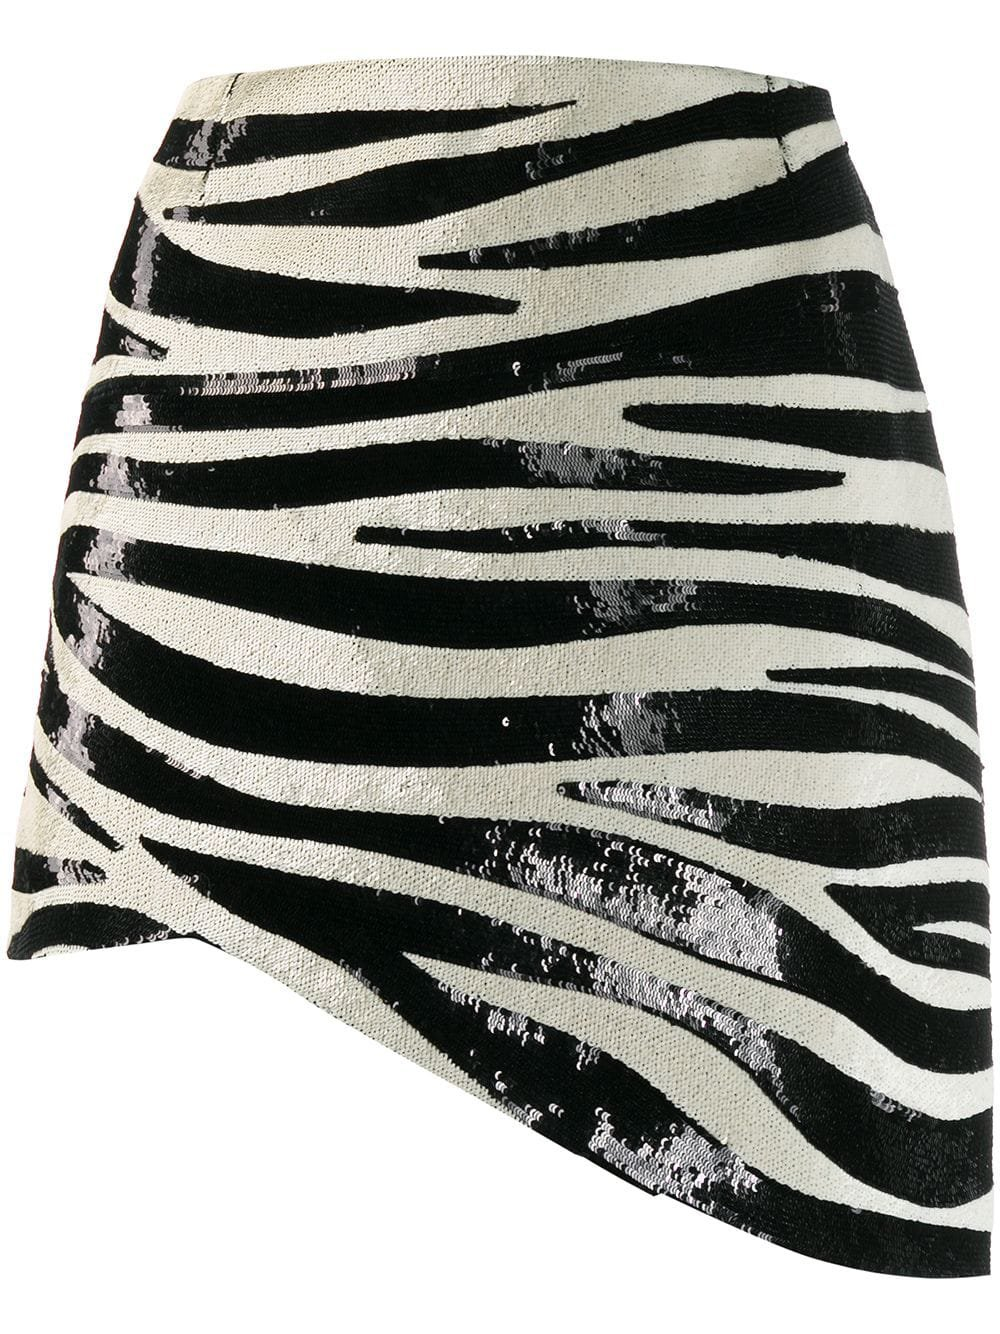 Saint Laurent Zebra Stripe Sequin Mini Skirt For Women   Farfetch.com